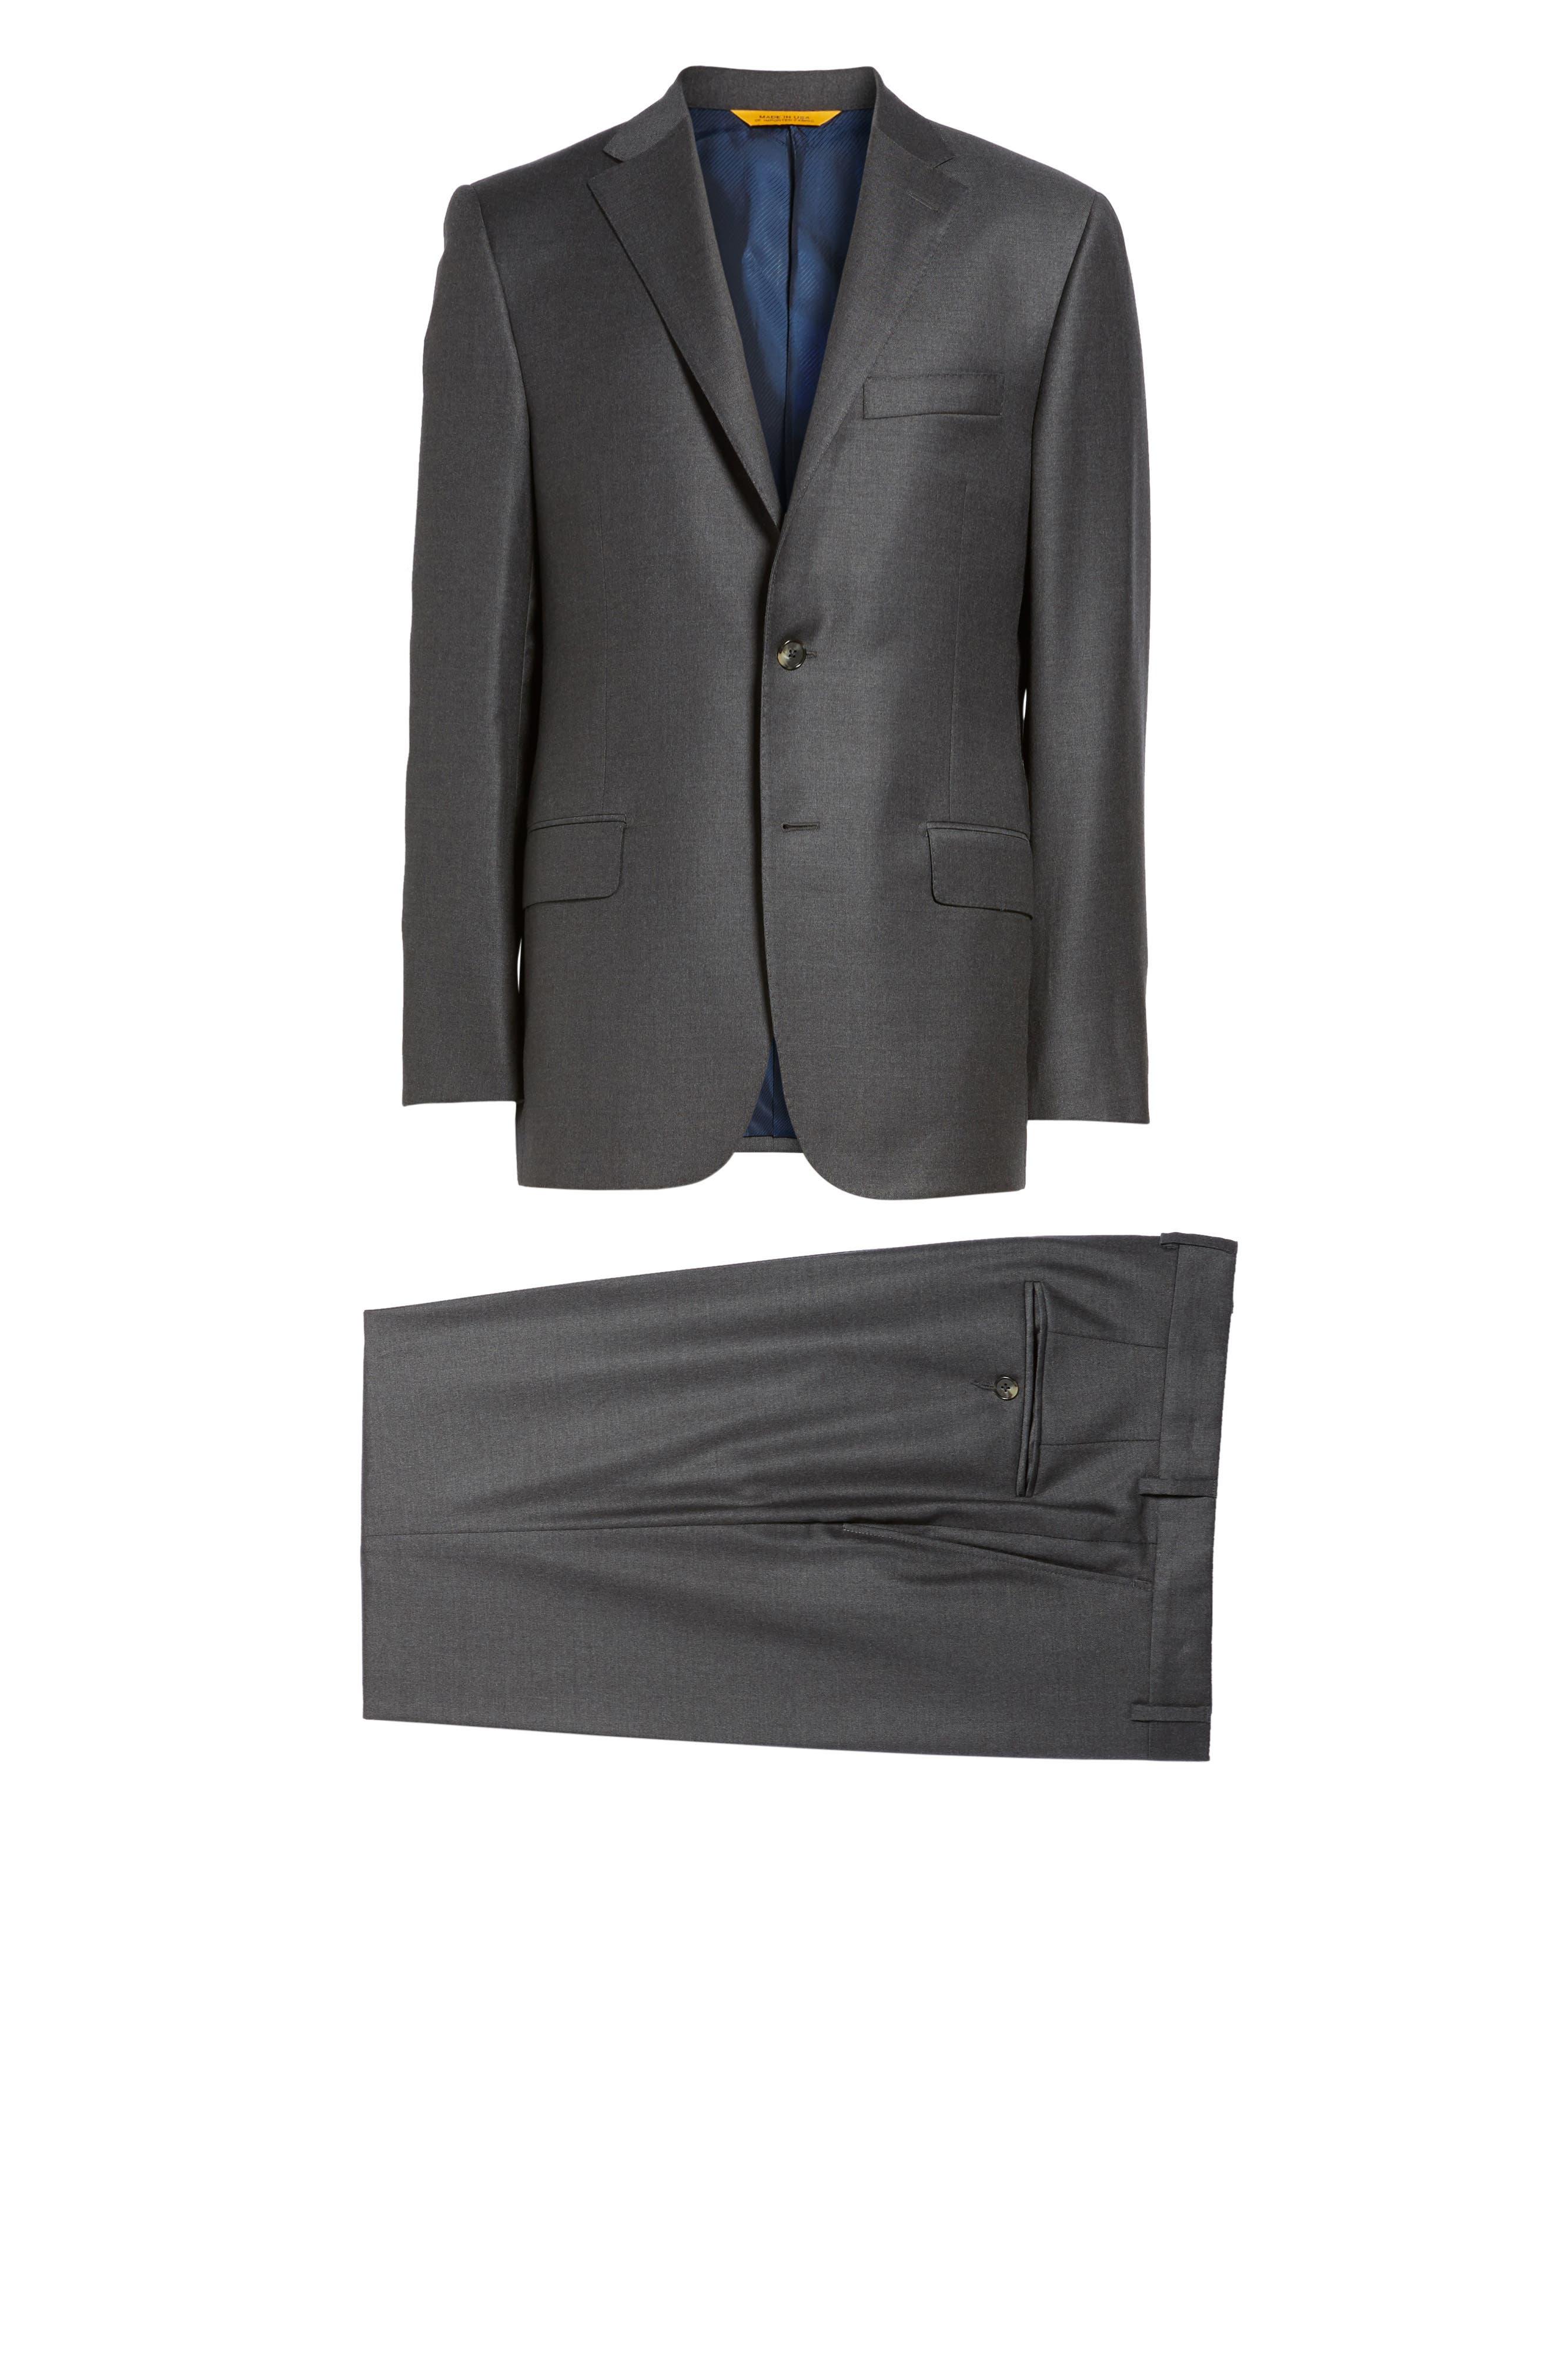 HICKEY FREEMAN, Classic B Fit Loro Piana Wool Suit, Alternate thumbnail 8, color, GREY